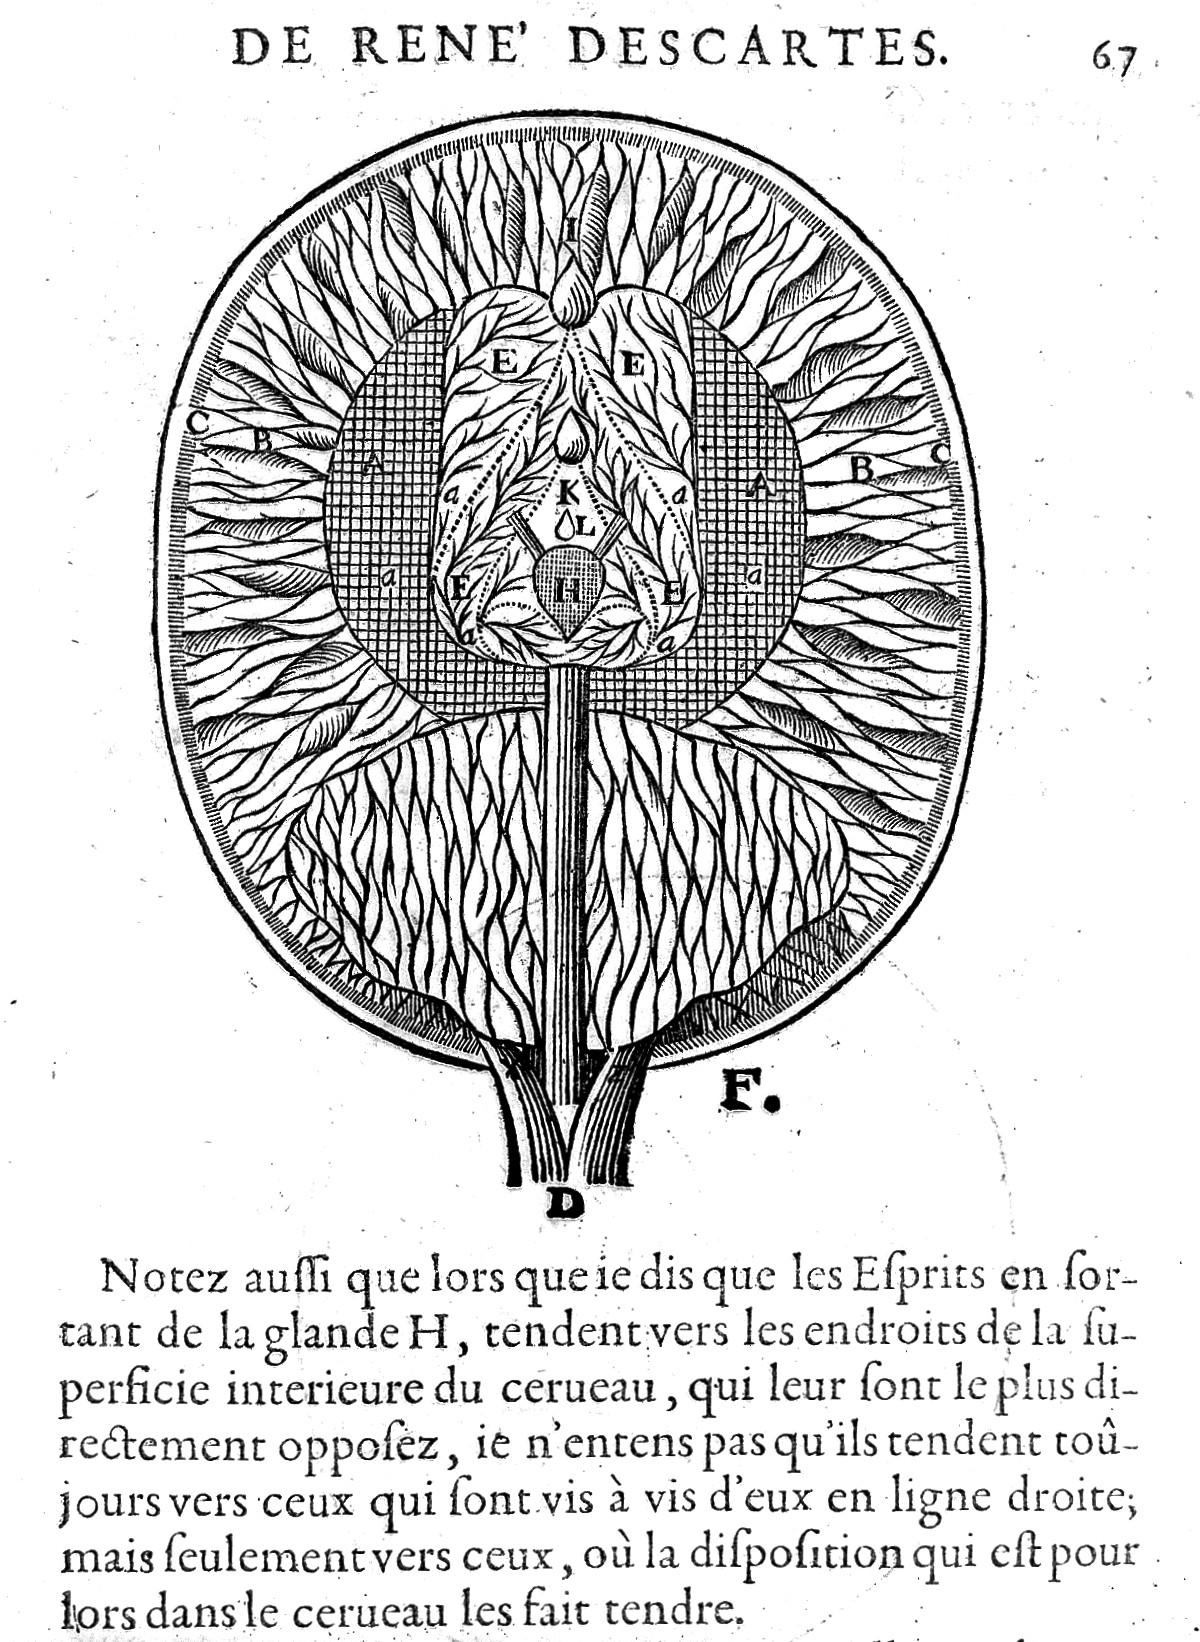 Description Of Brain